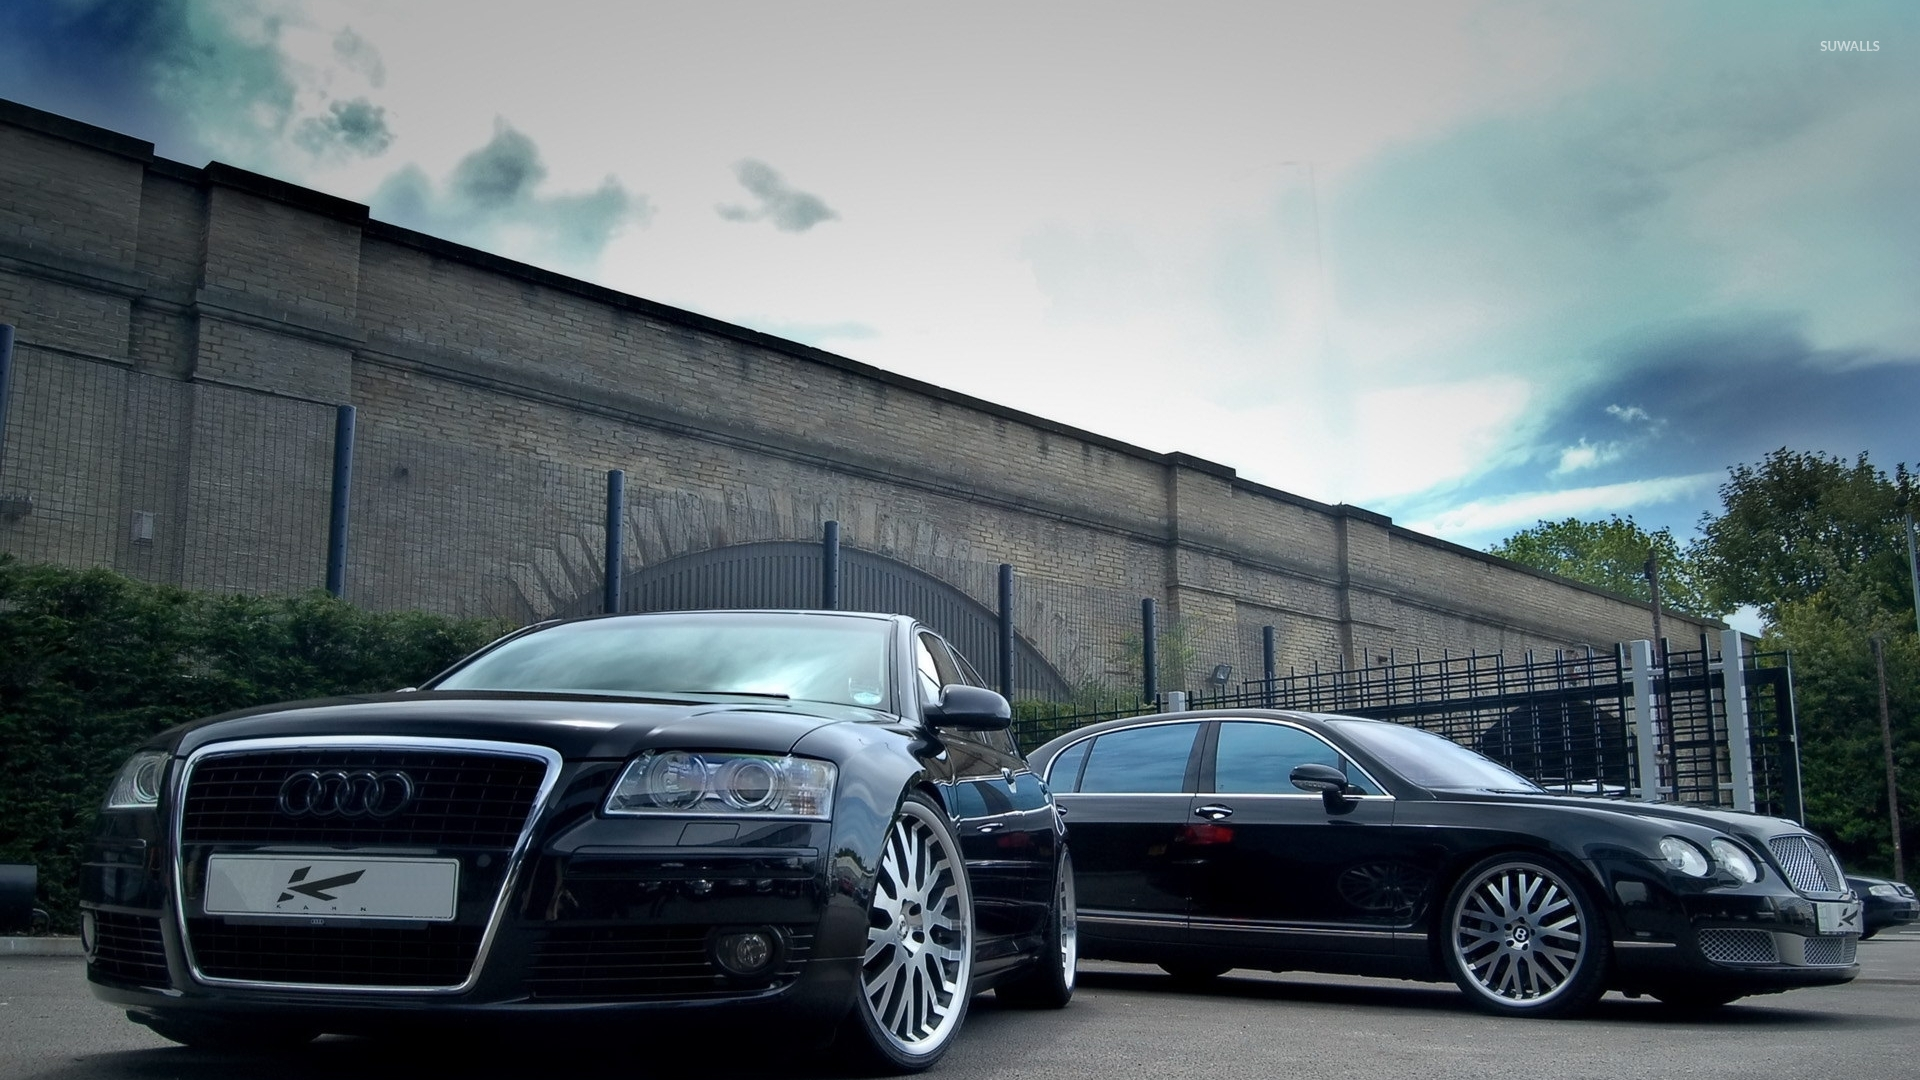 Audi A8 and Bentley Continental wallpaper   Car wallpapers   9319 1920x1080